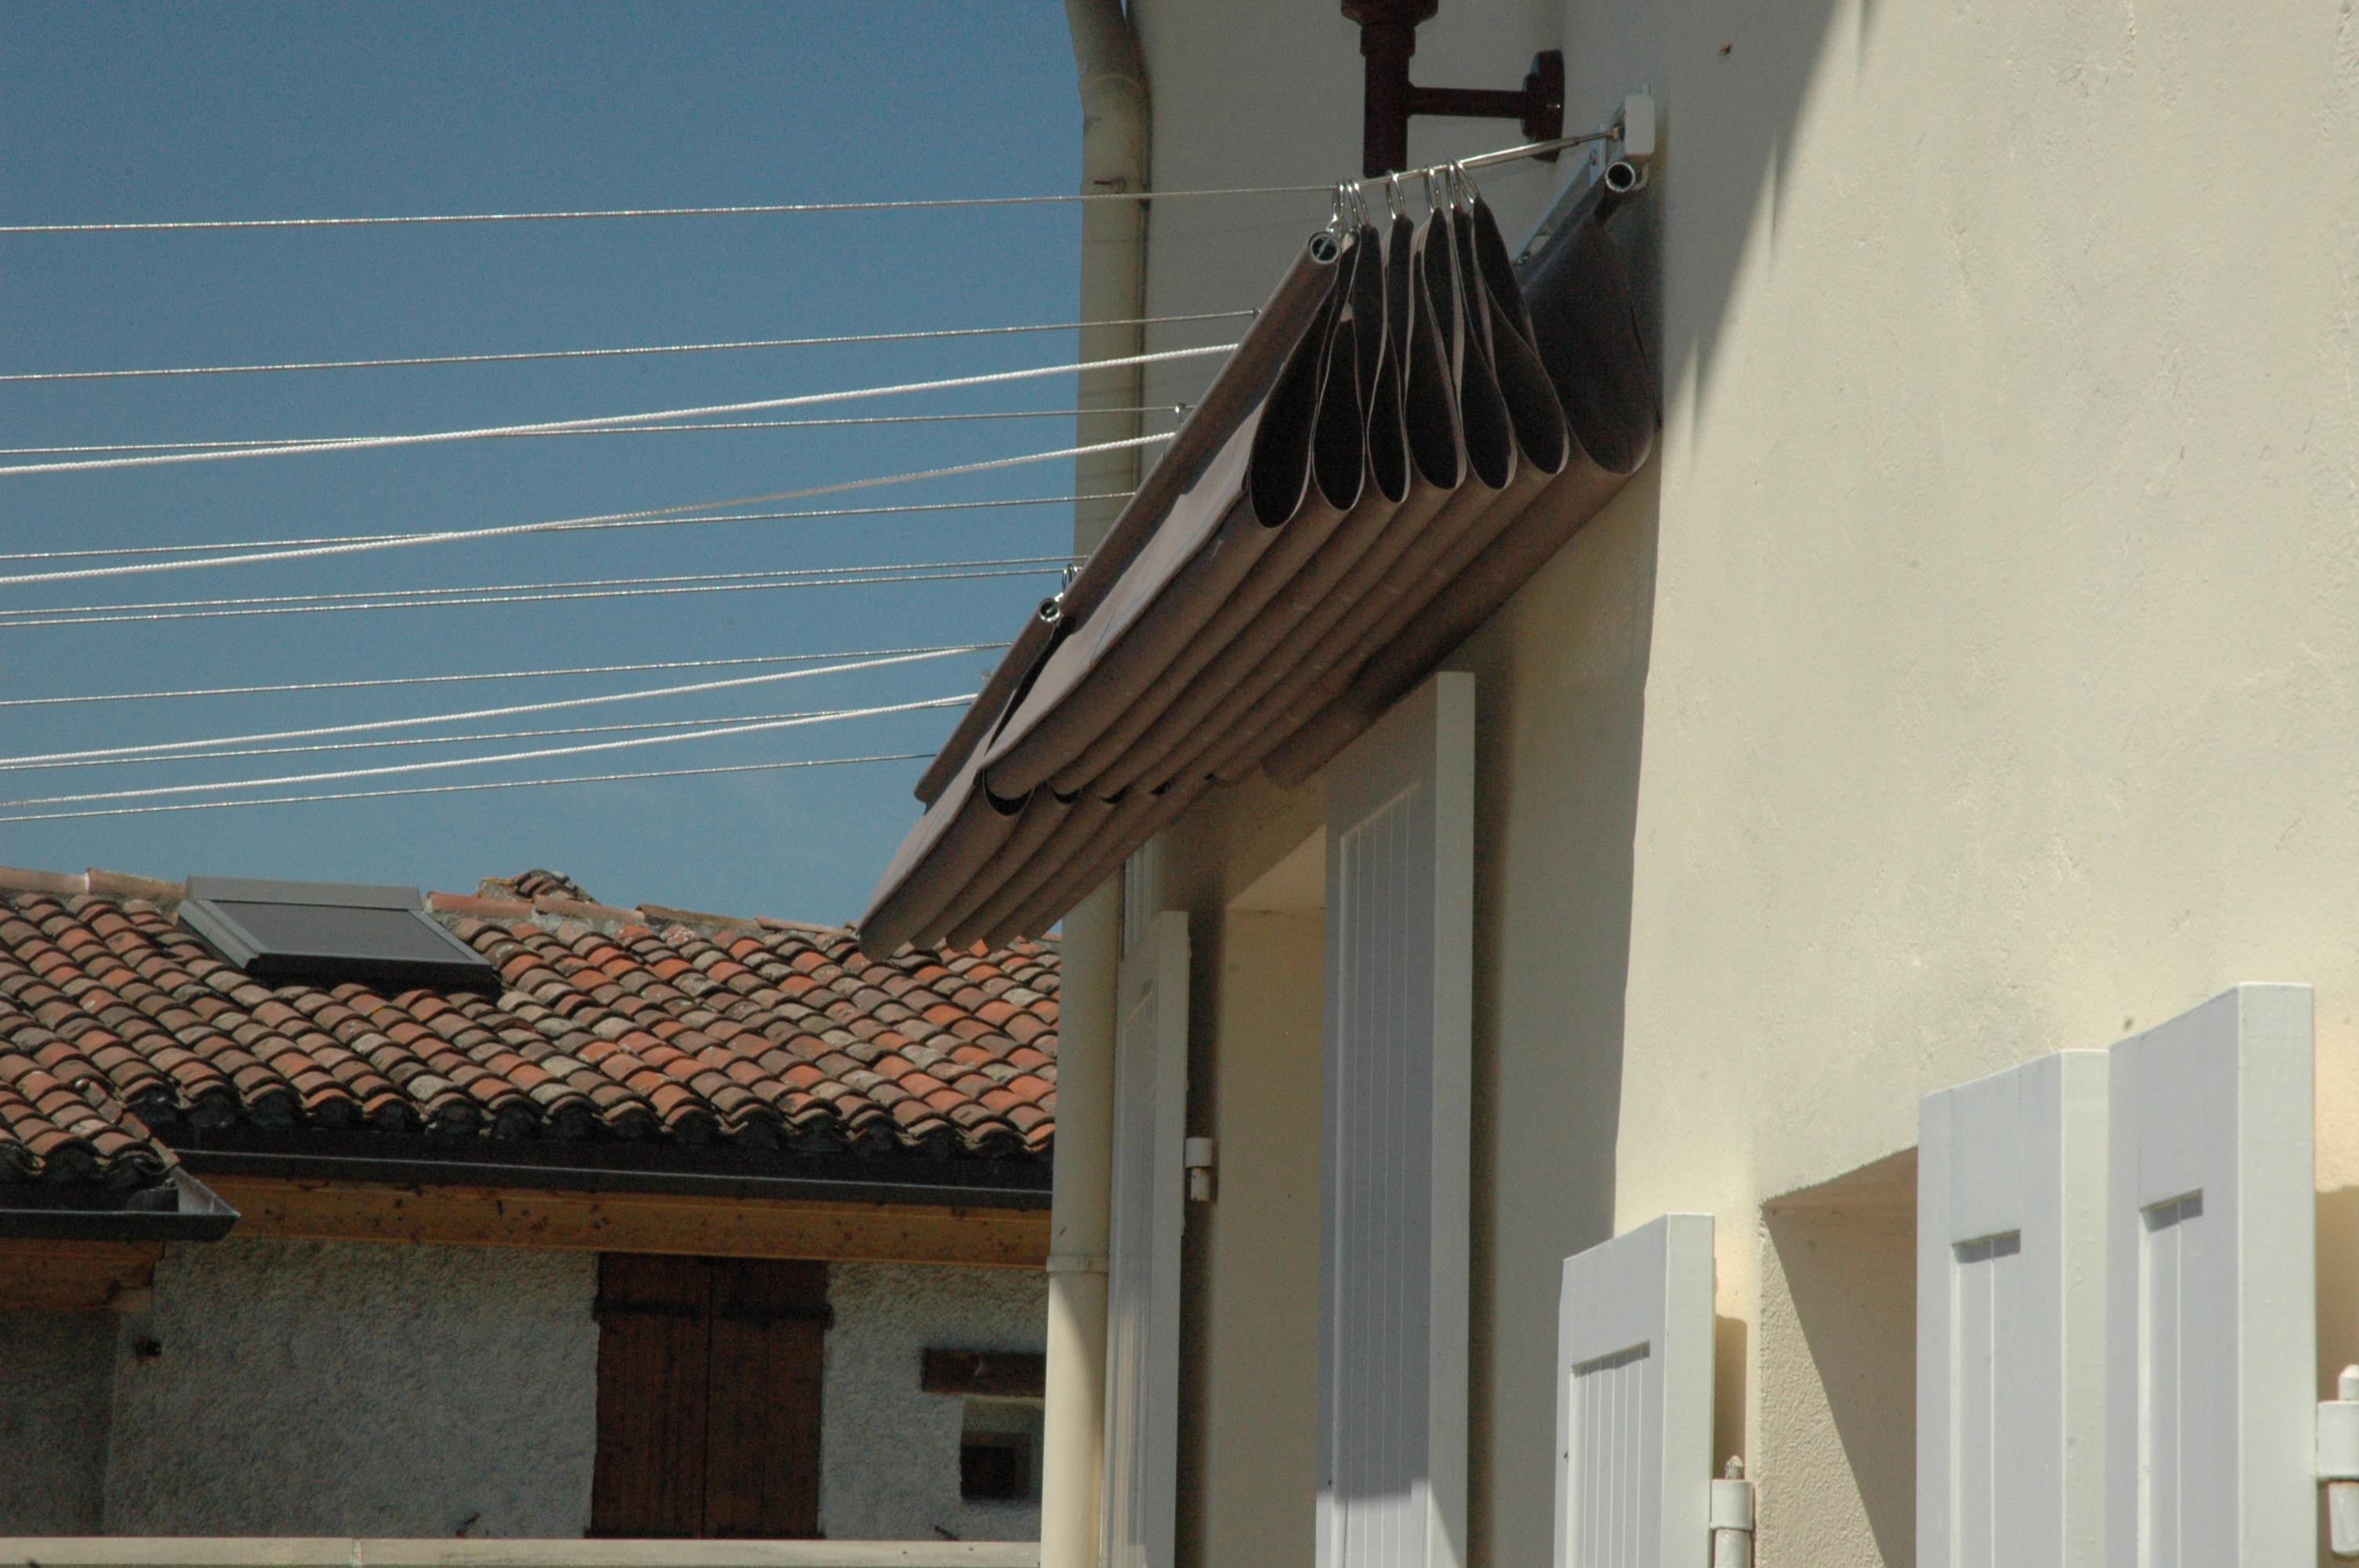 Abriter du soleil une terrasse vent e et plein sud - Protege soleil terrasse ...